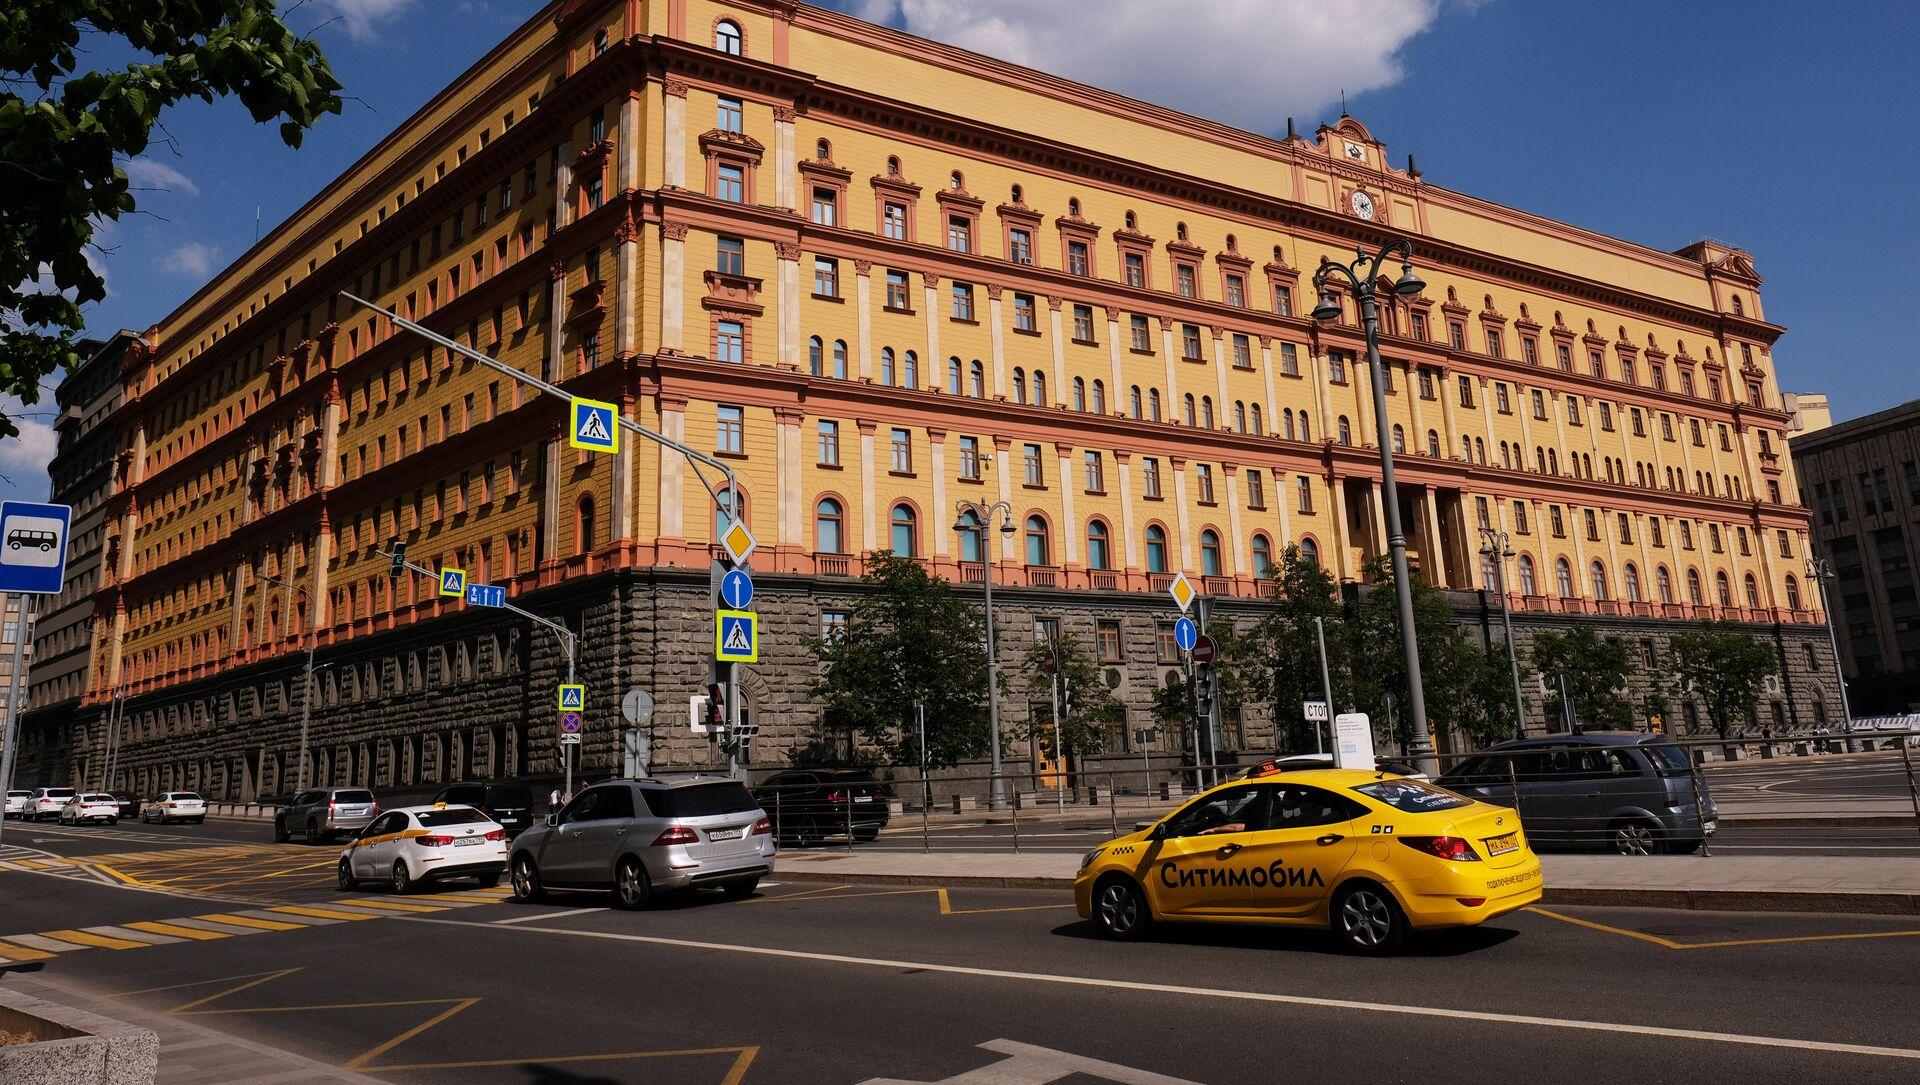 Siège du FSB à Moscou - Sputnik France, 1920, 04.08.2021